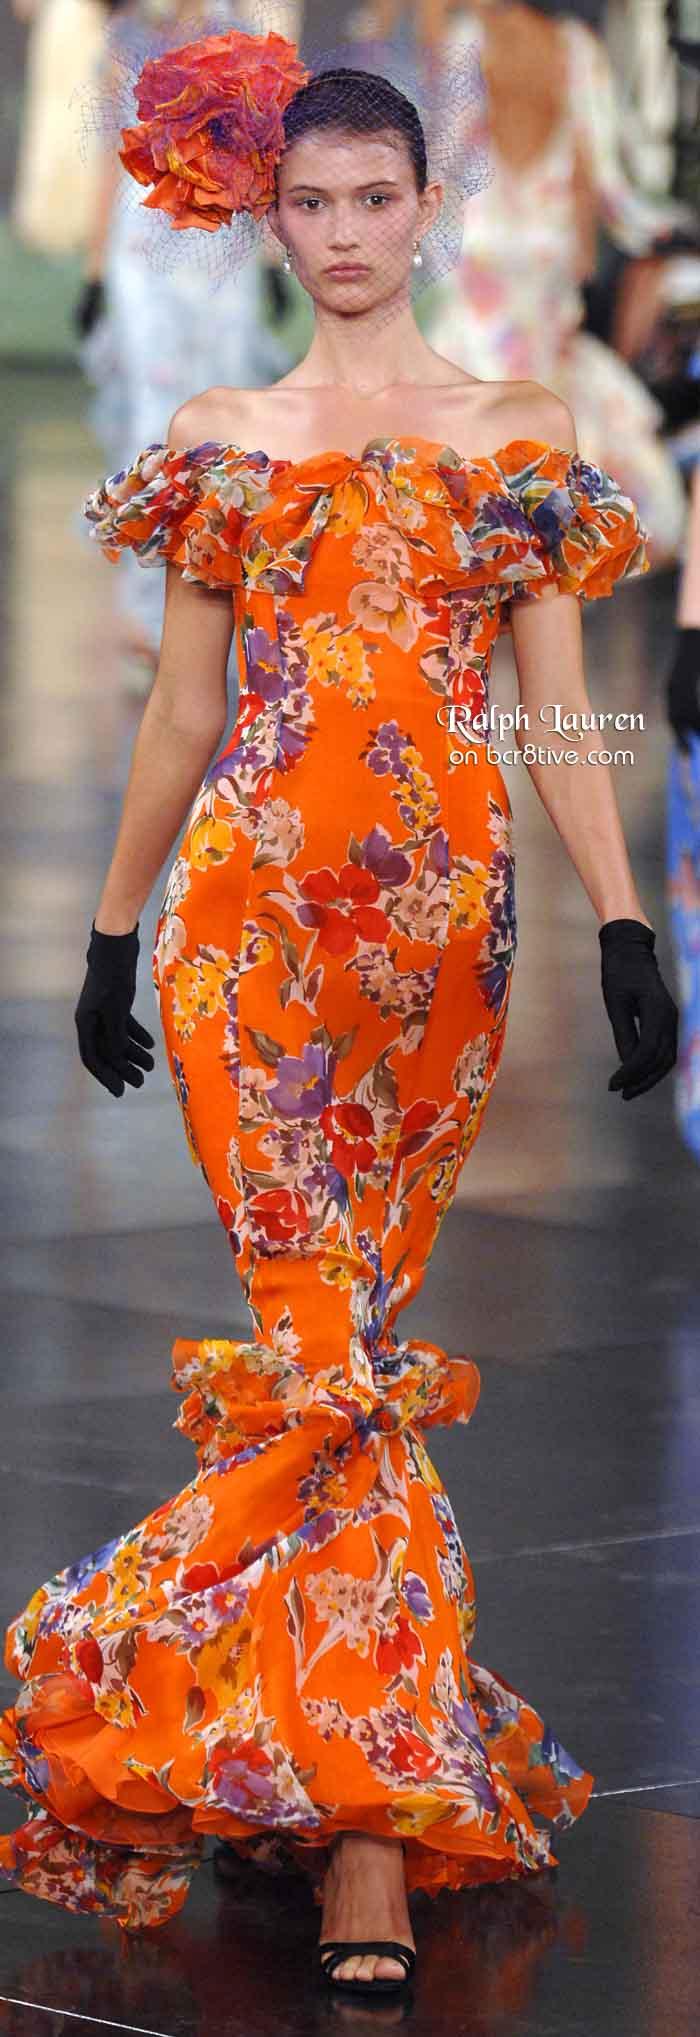 Ralph Lauren Spring Summer 2008 RTW